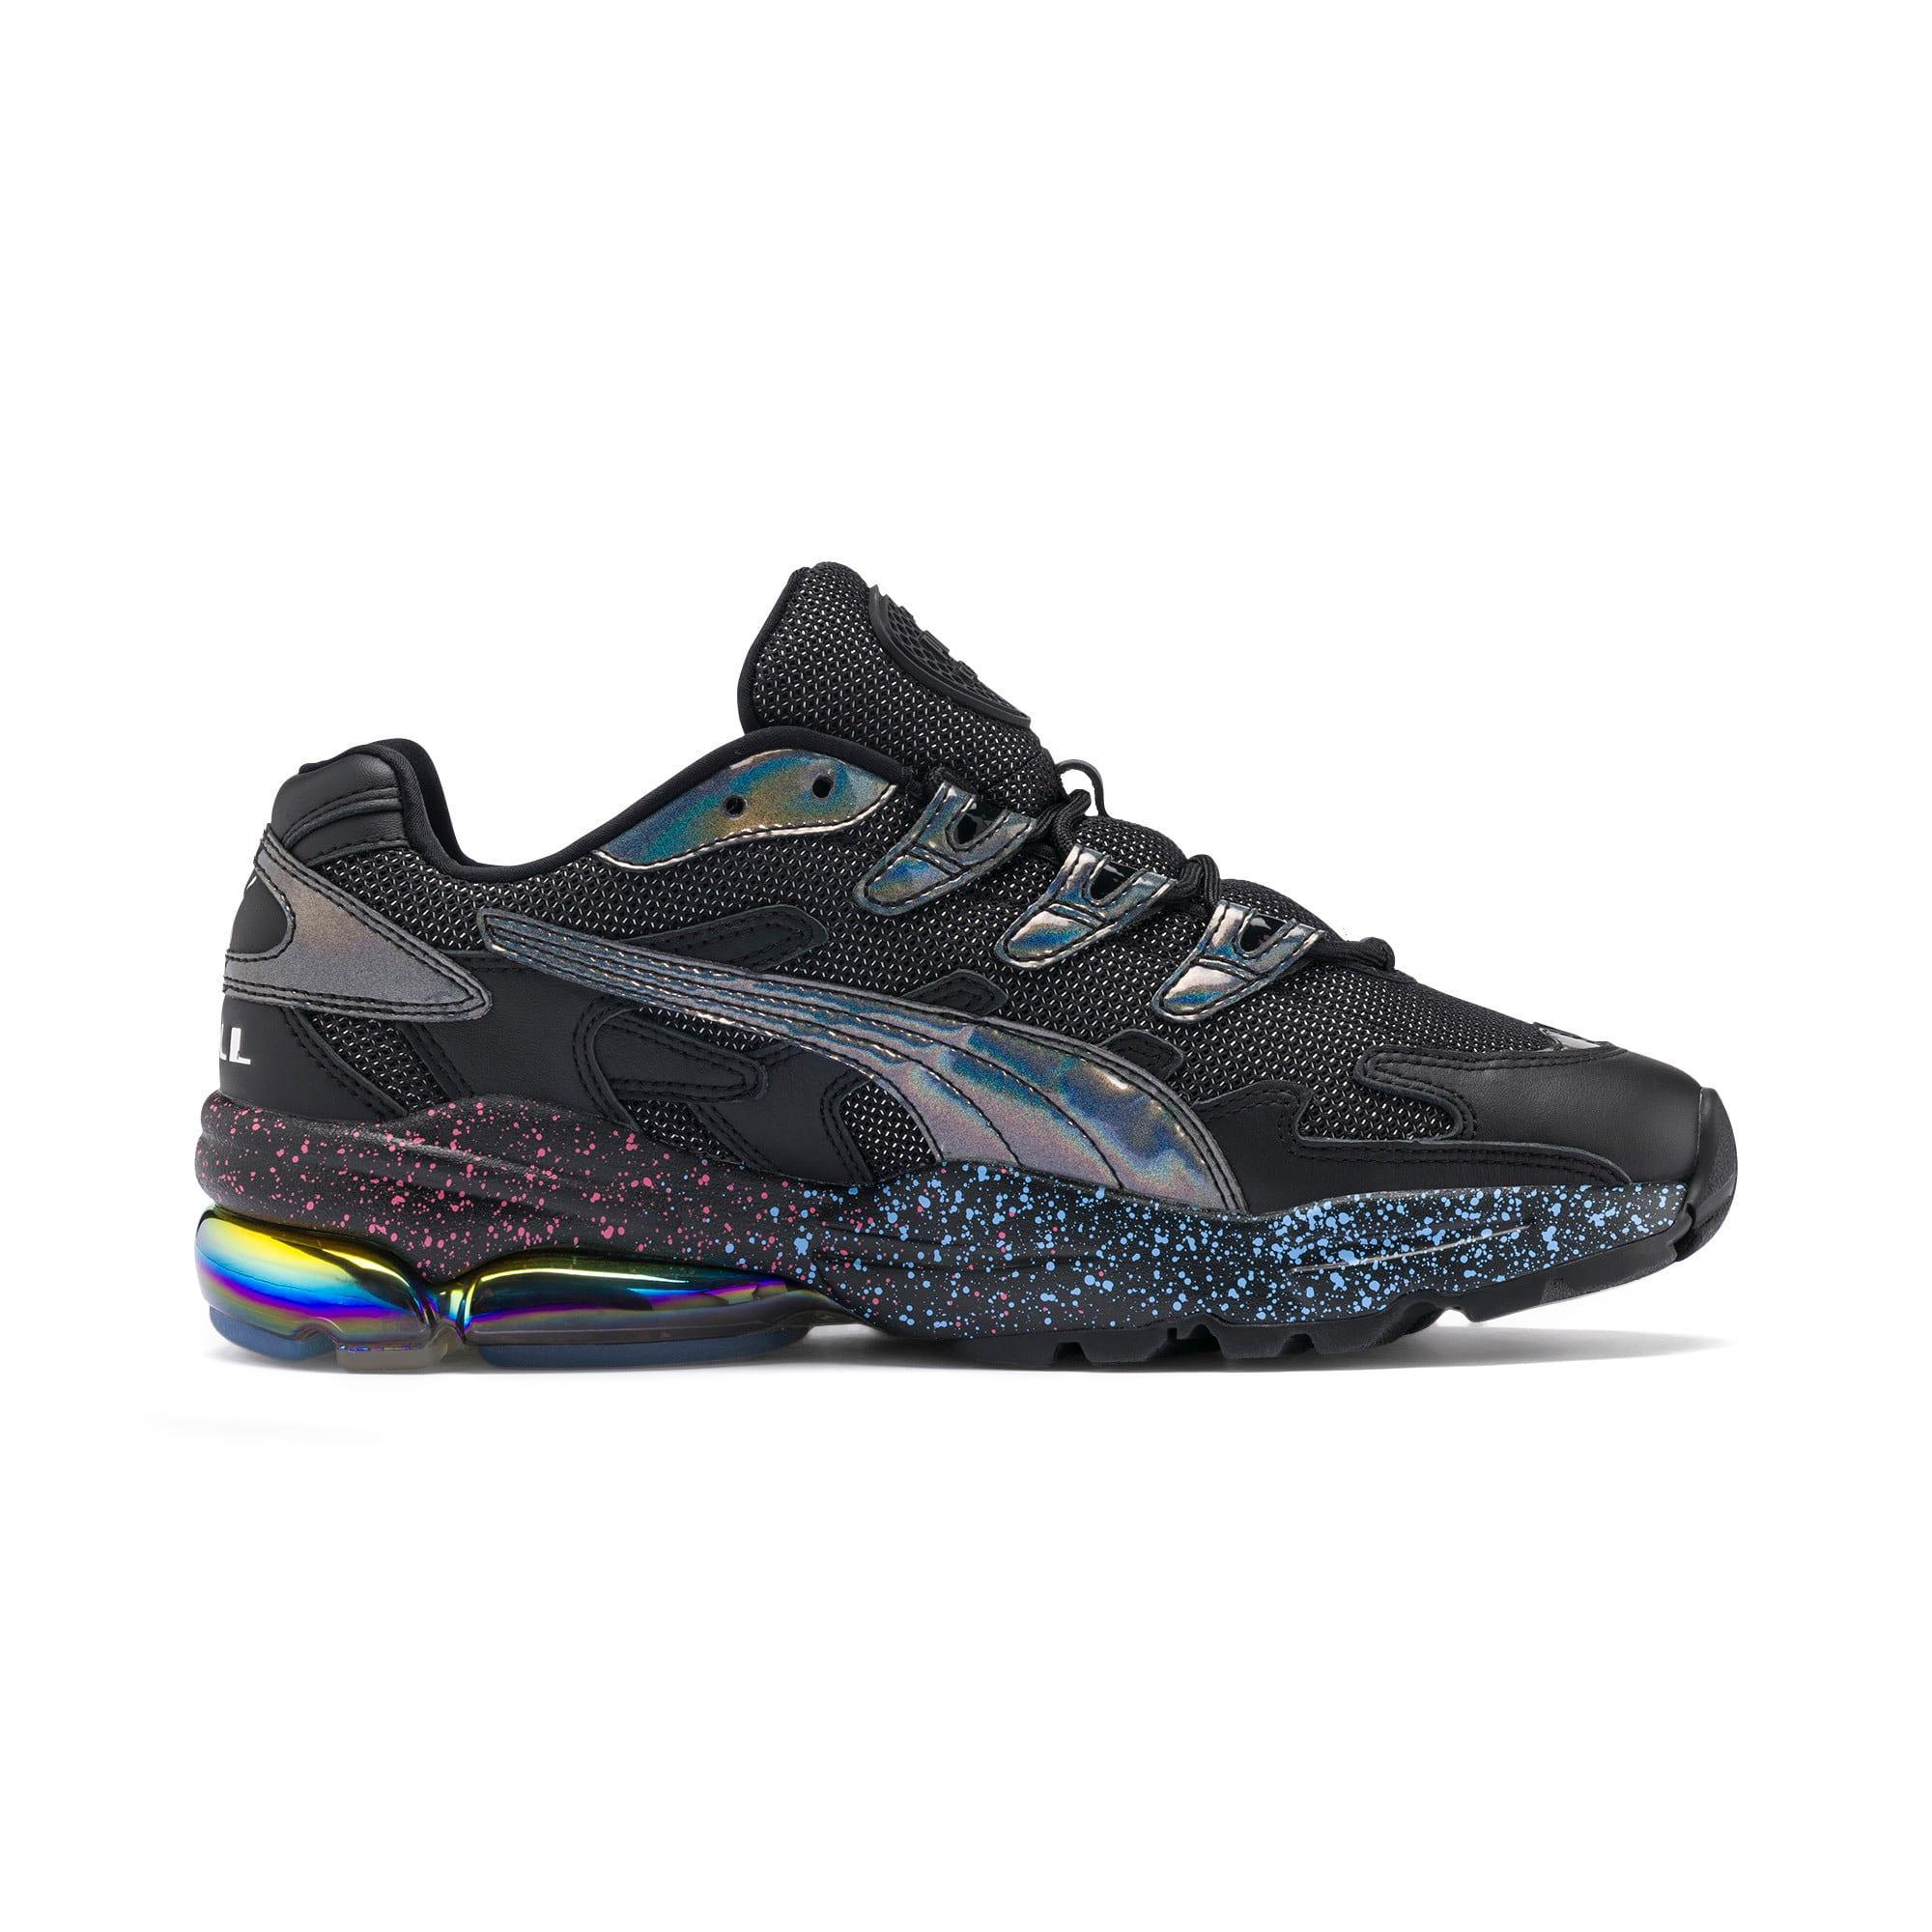 Thumbnail 5 of CELL Alien X Space Agency Sneakers, Puma Black-Puma Black, medium